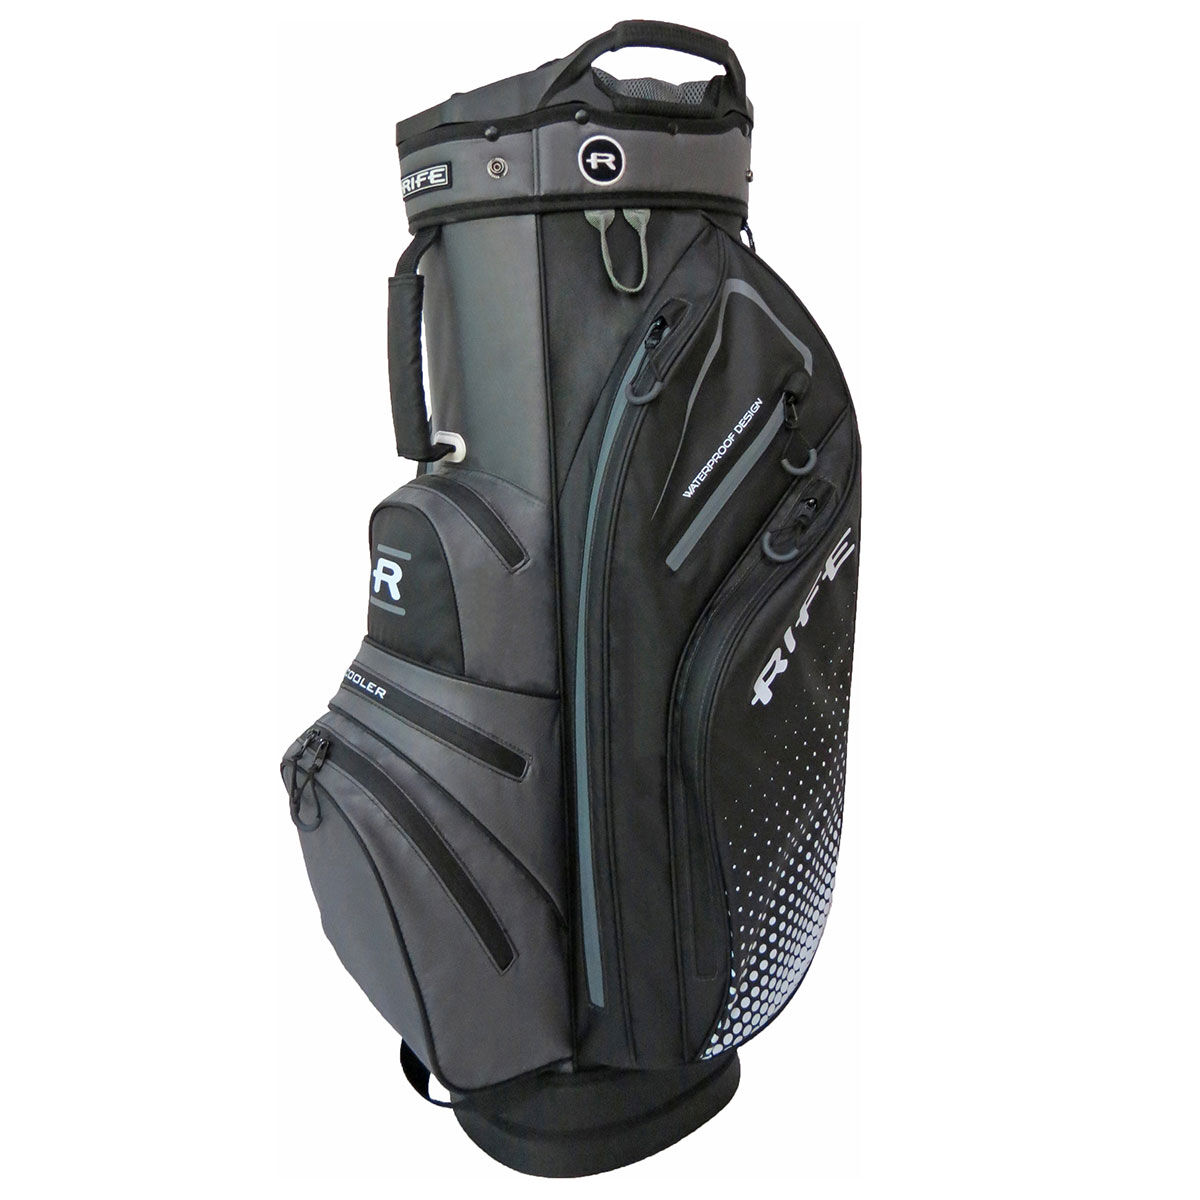 Rife Black Waterproof Golf Cart Bag, Size: One Size   American Golf   American Golf